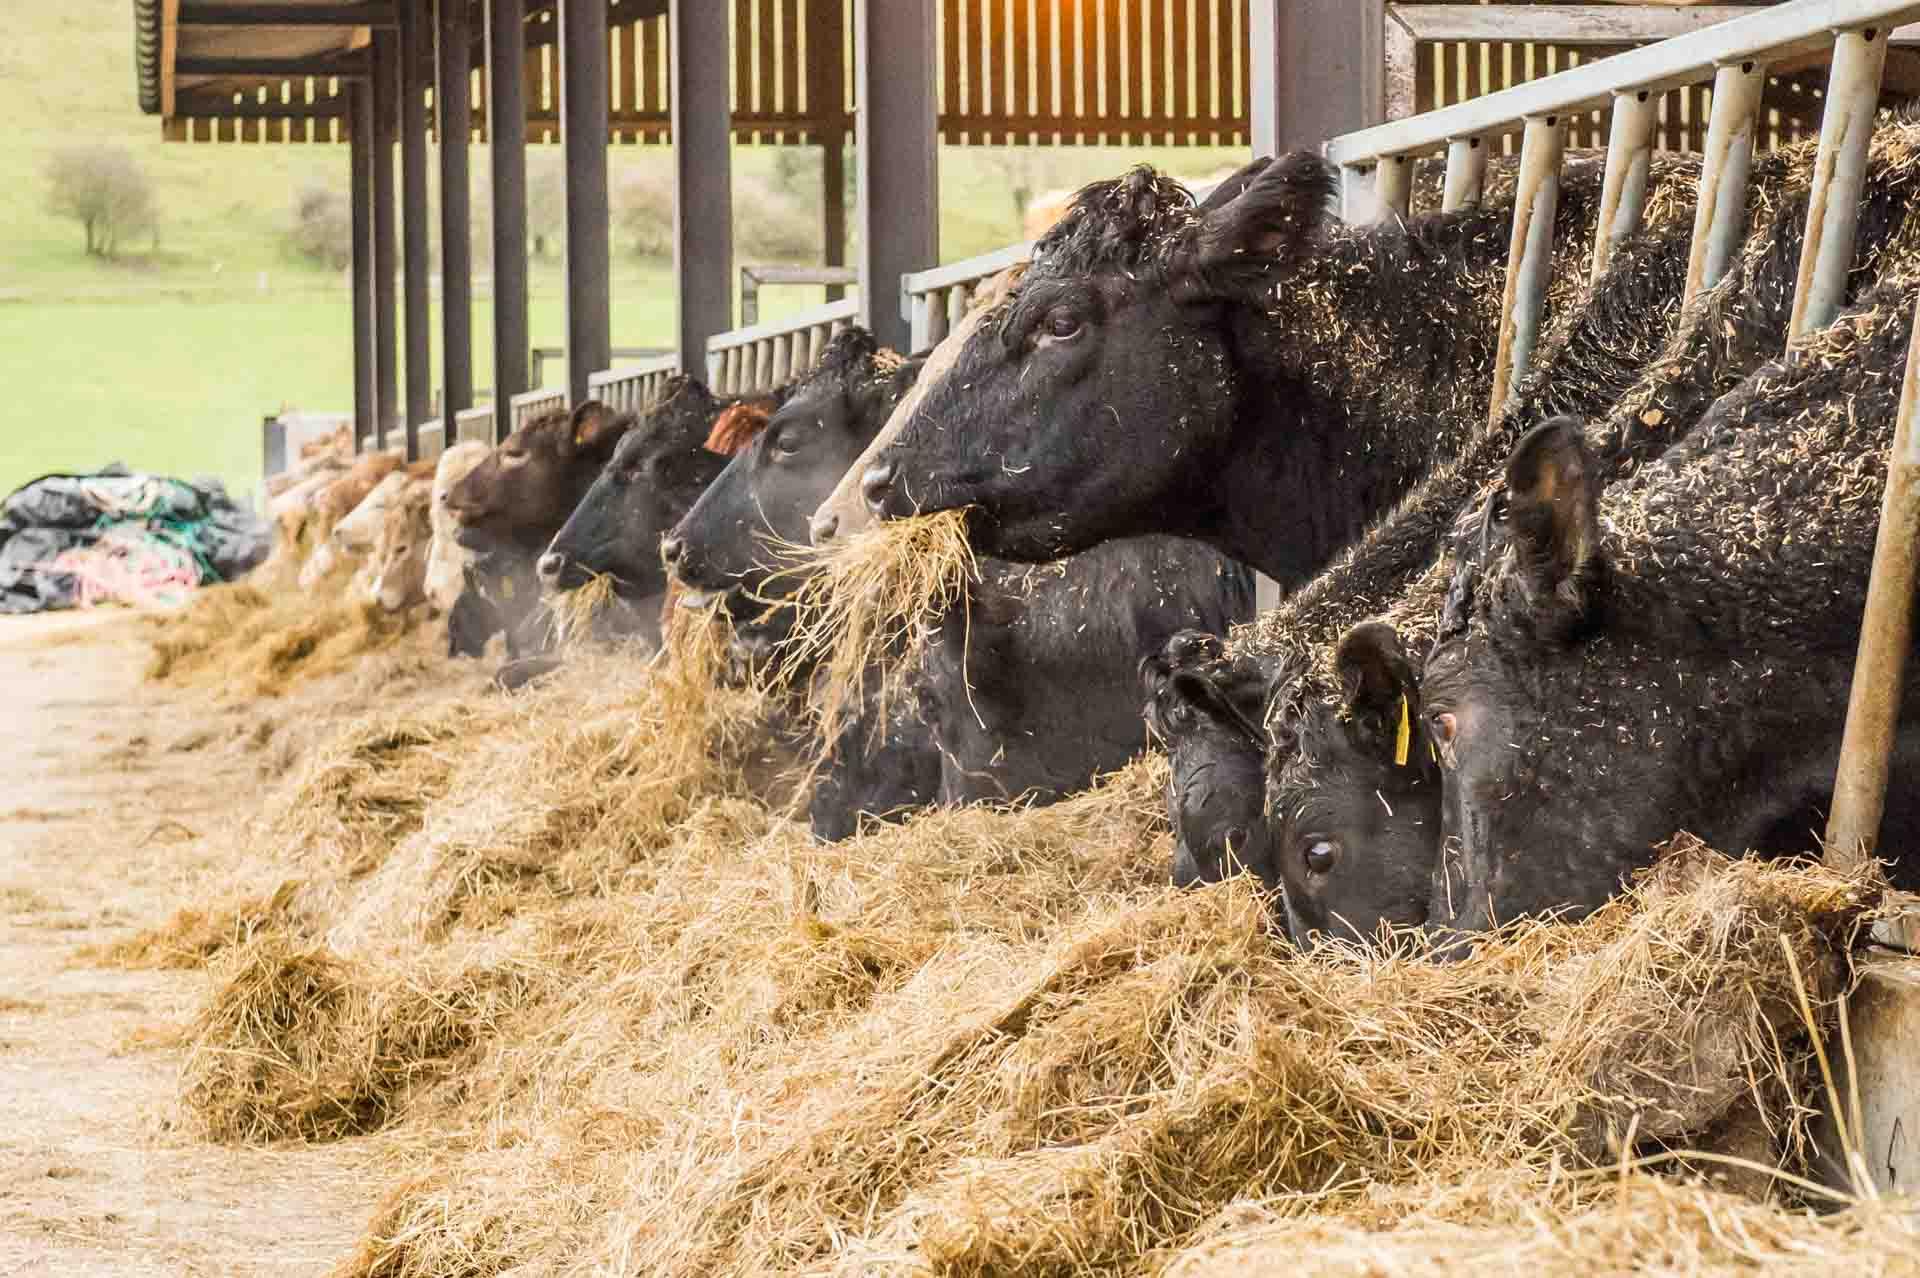 Angus-Friesan cross cattle eating hay and barley